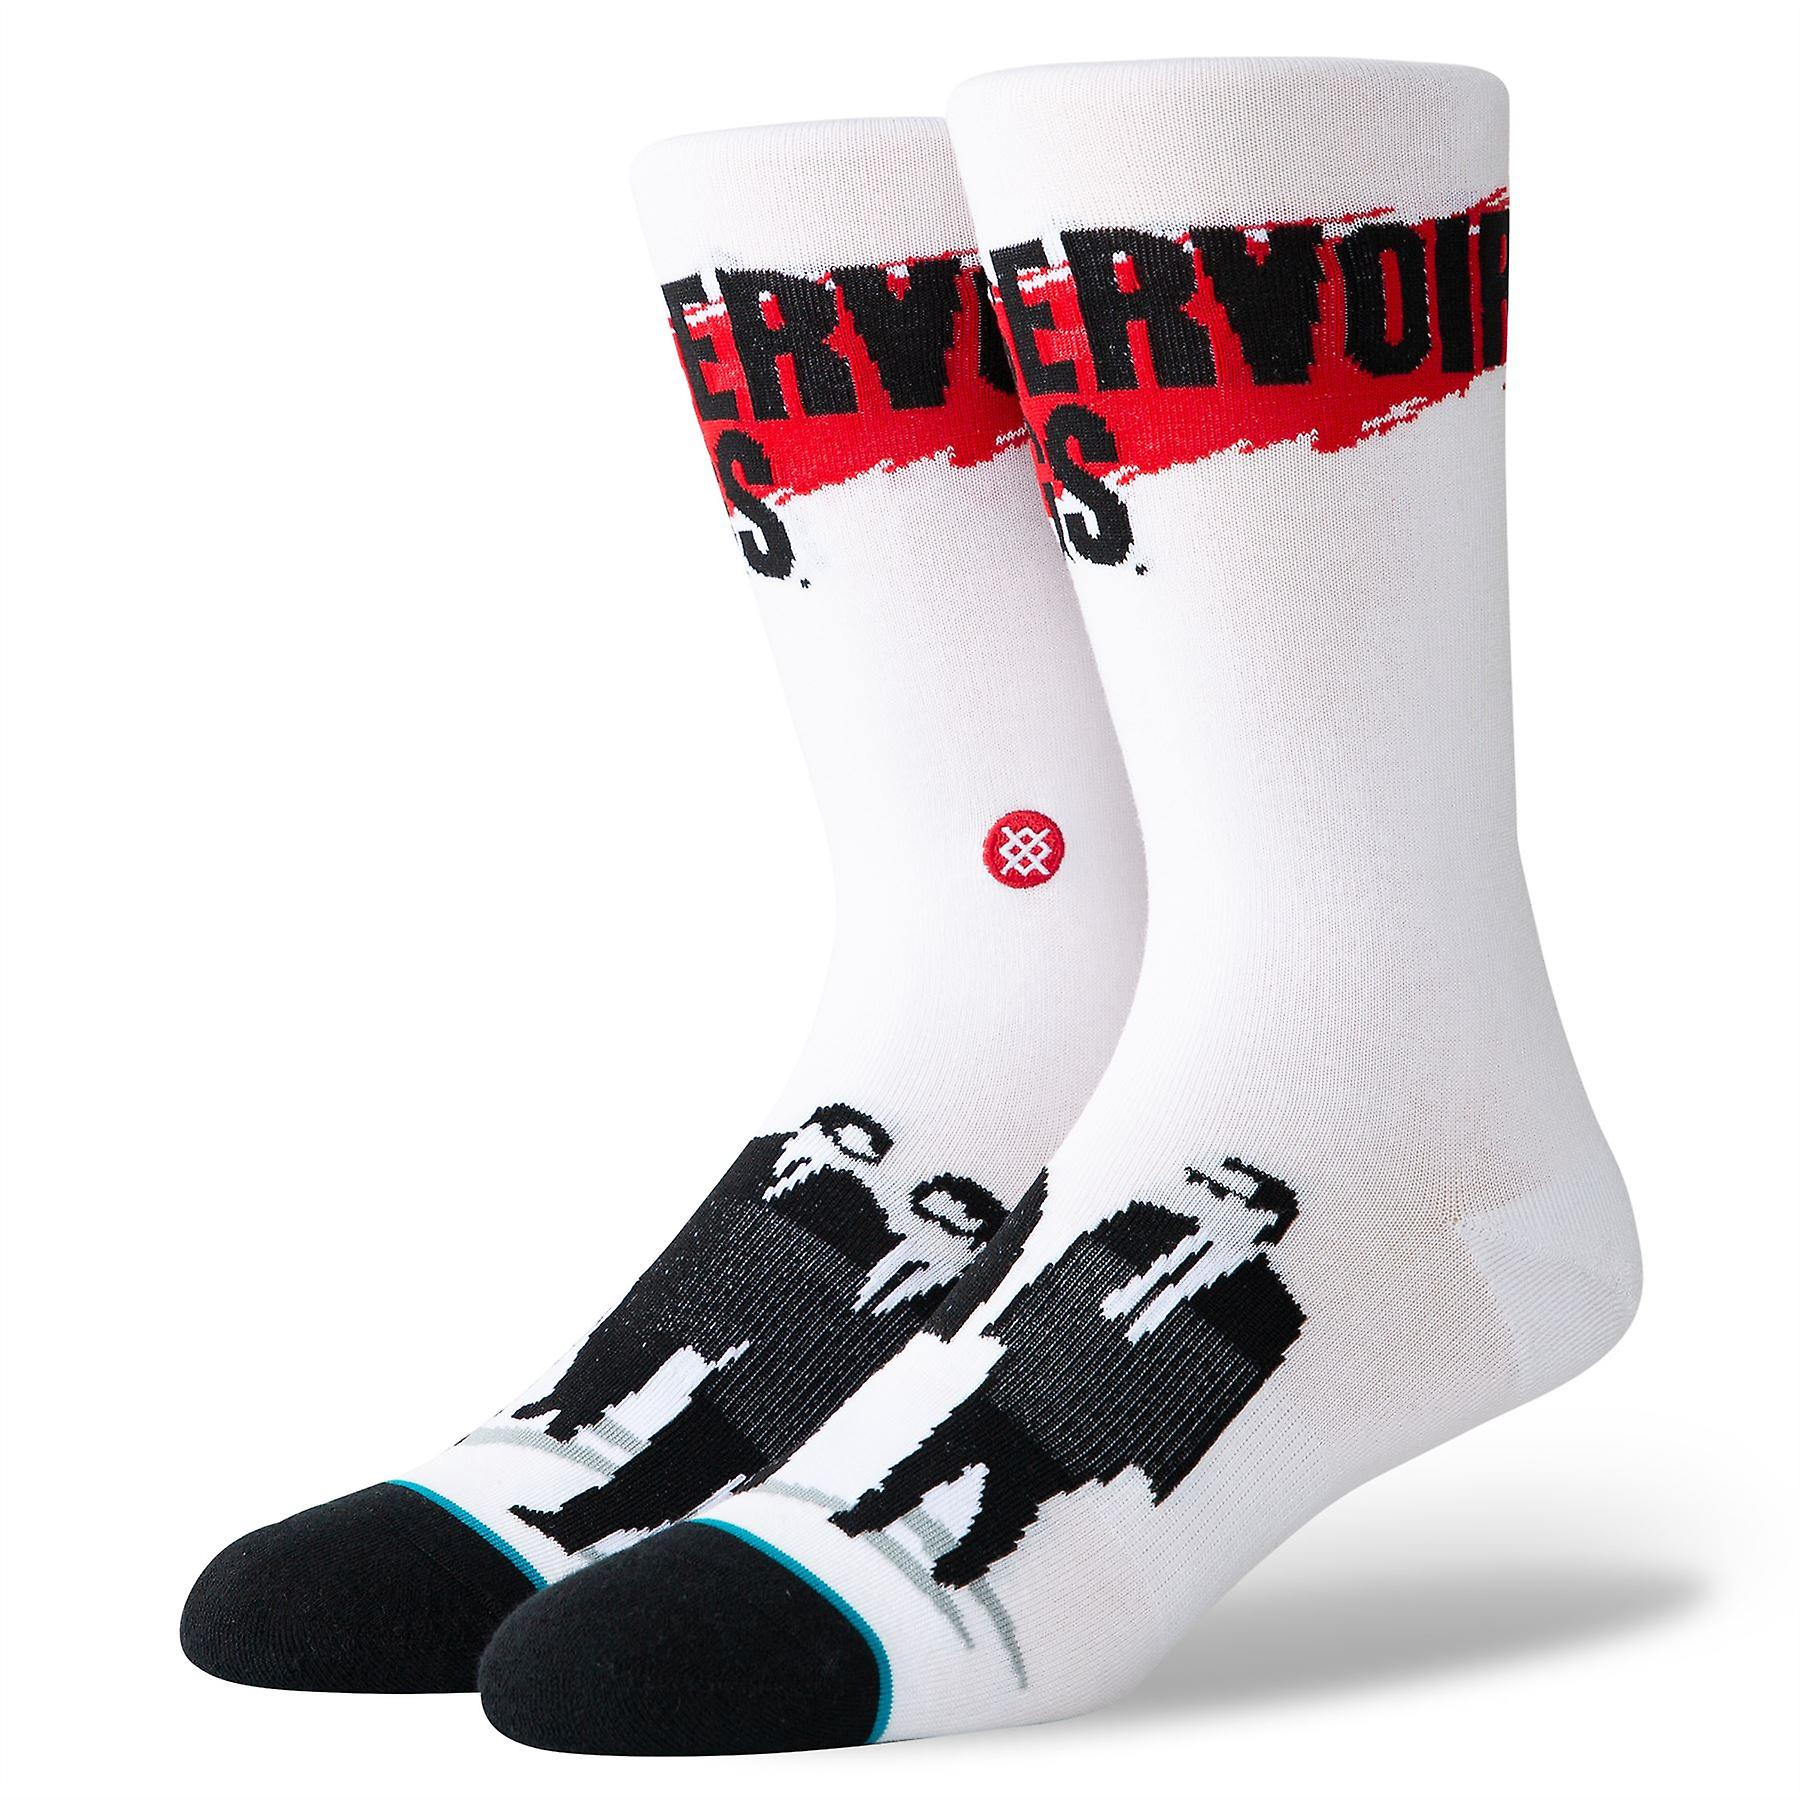 Stance Foundation Mens Socks ~ Reservoir Dogs white (size L)